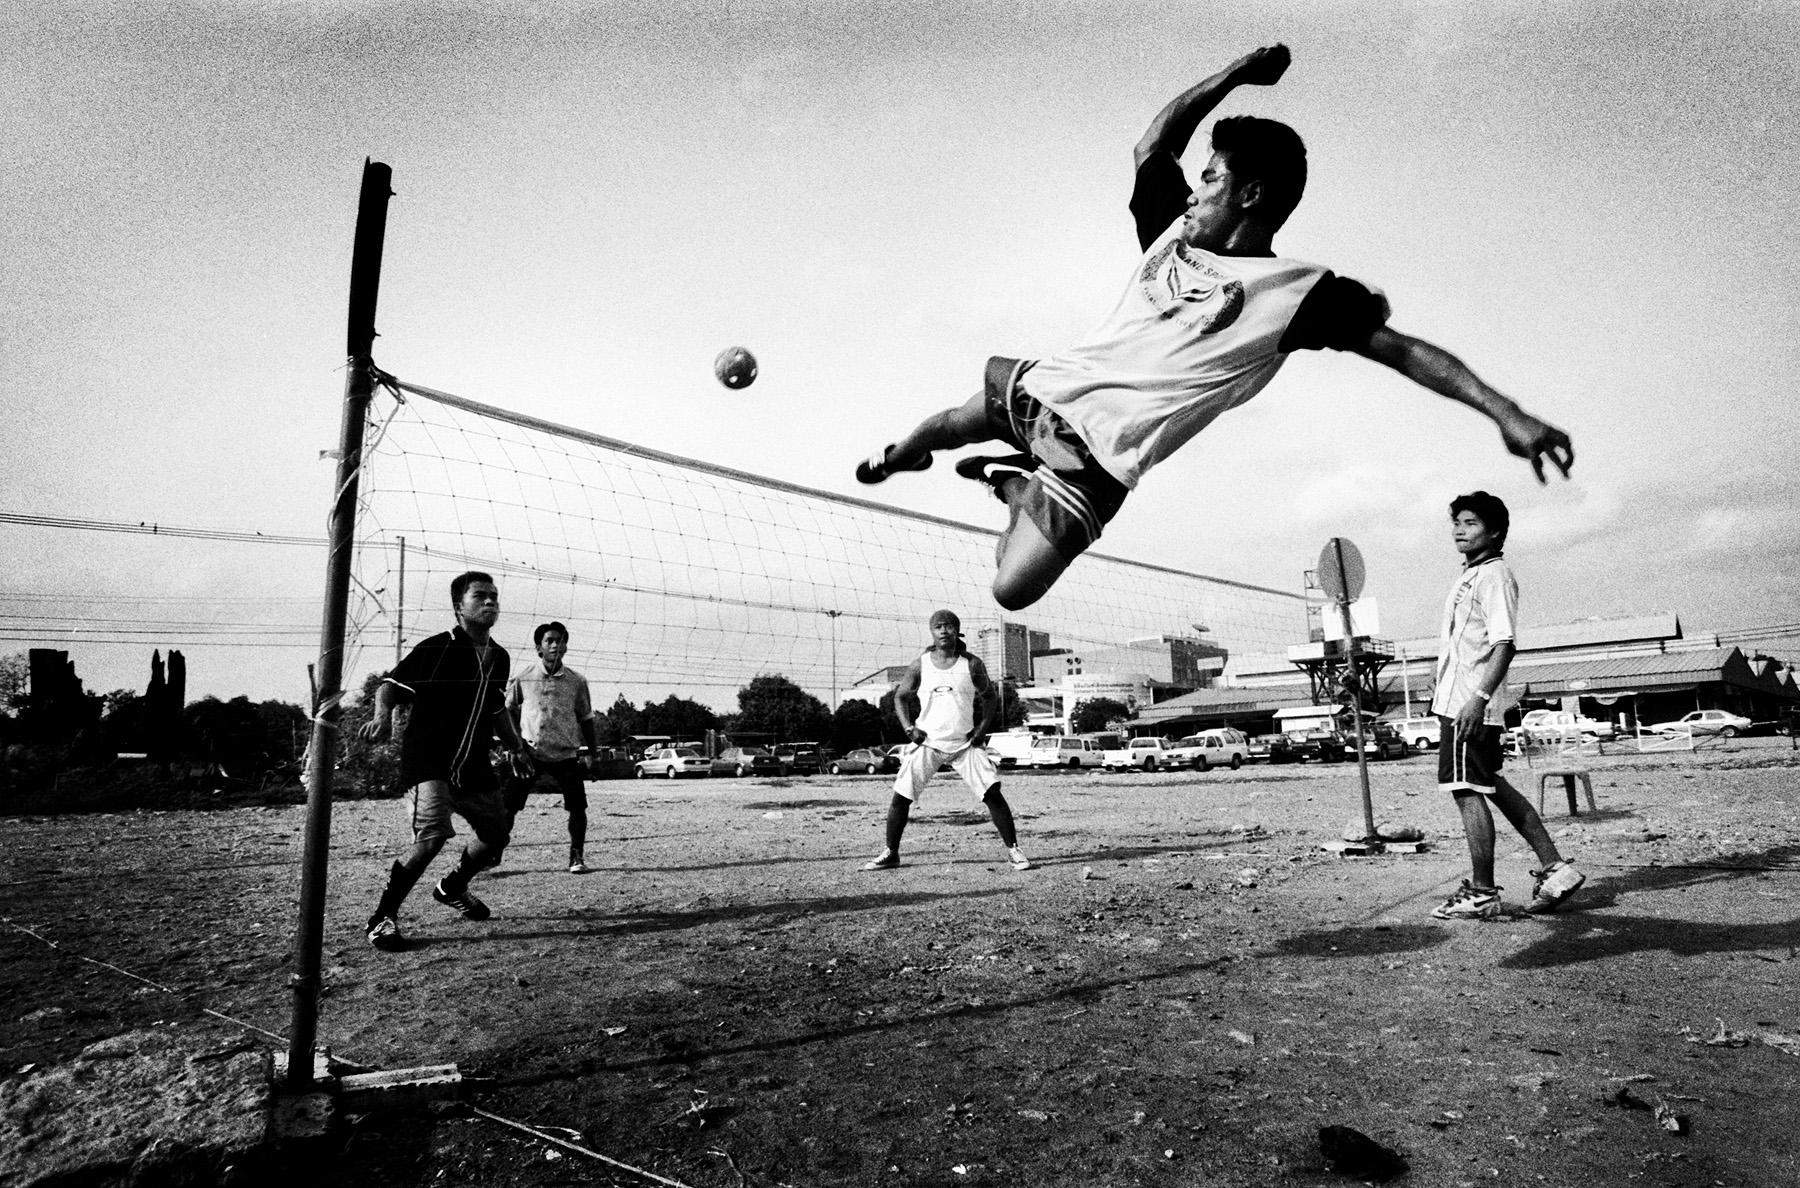 A Takraw player kicks the ball during a takraw game in Bangkok, Thailand